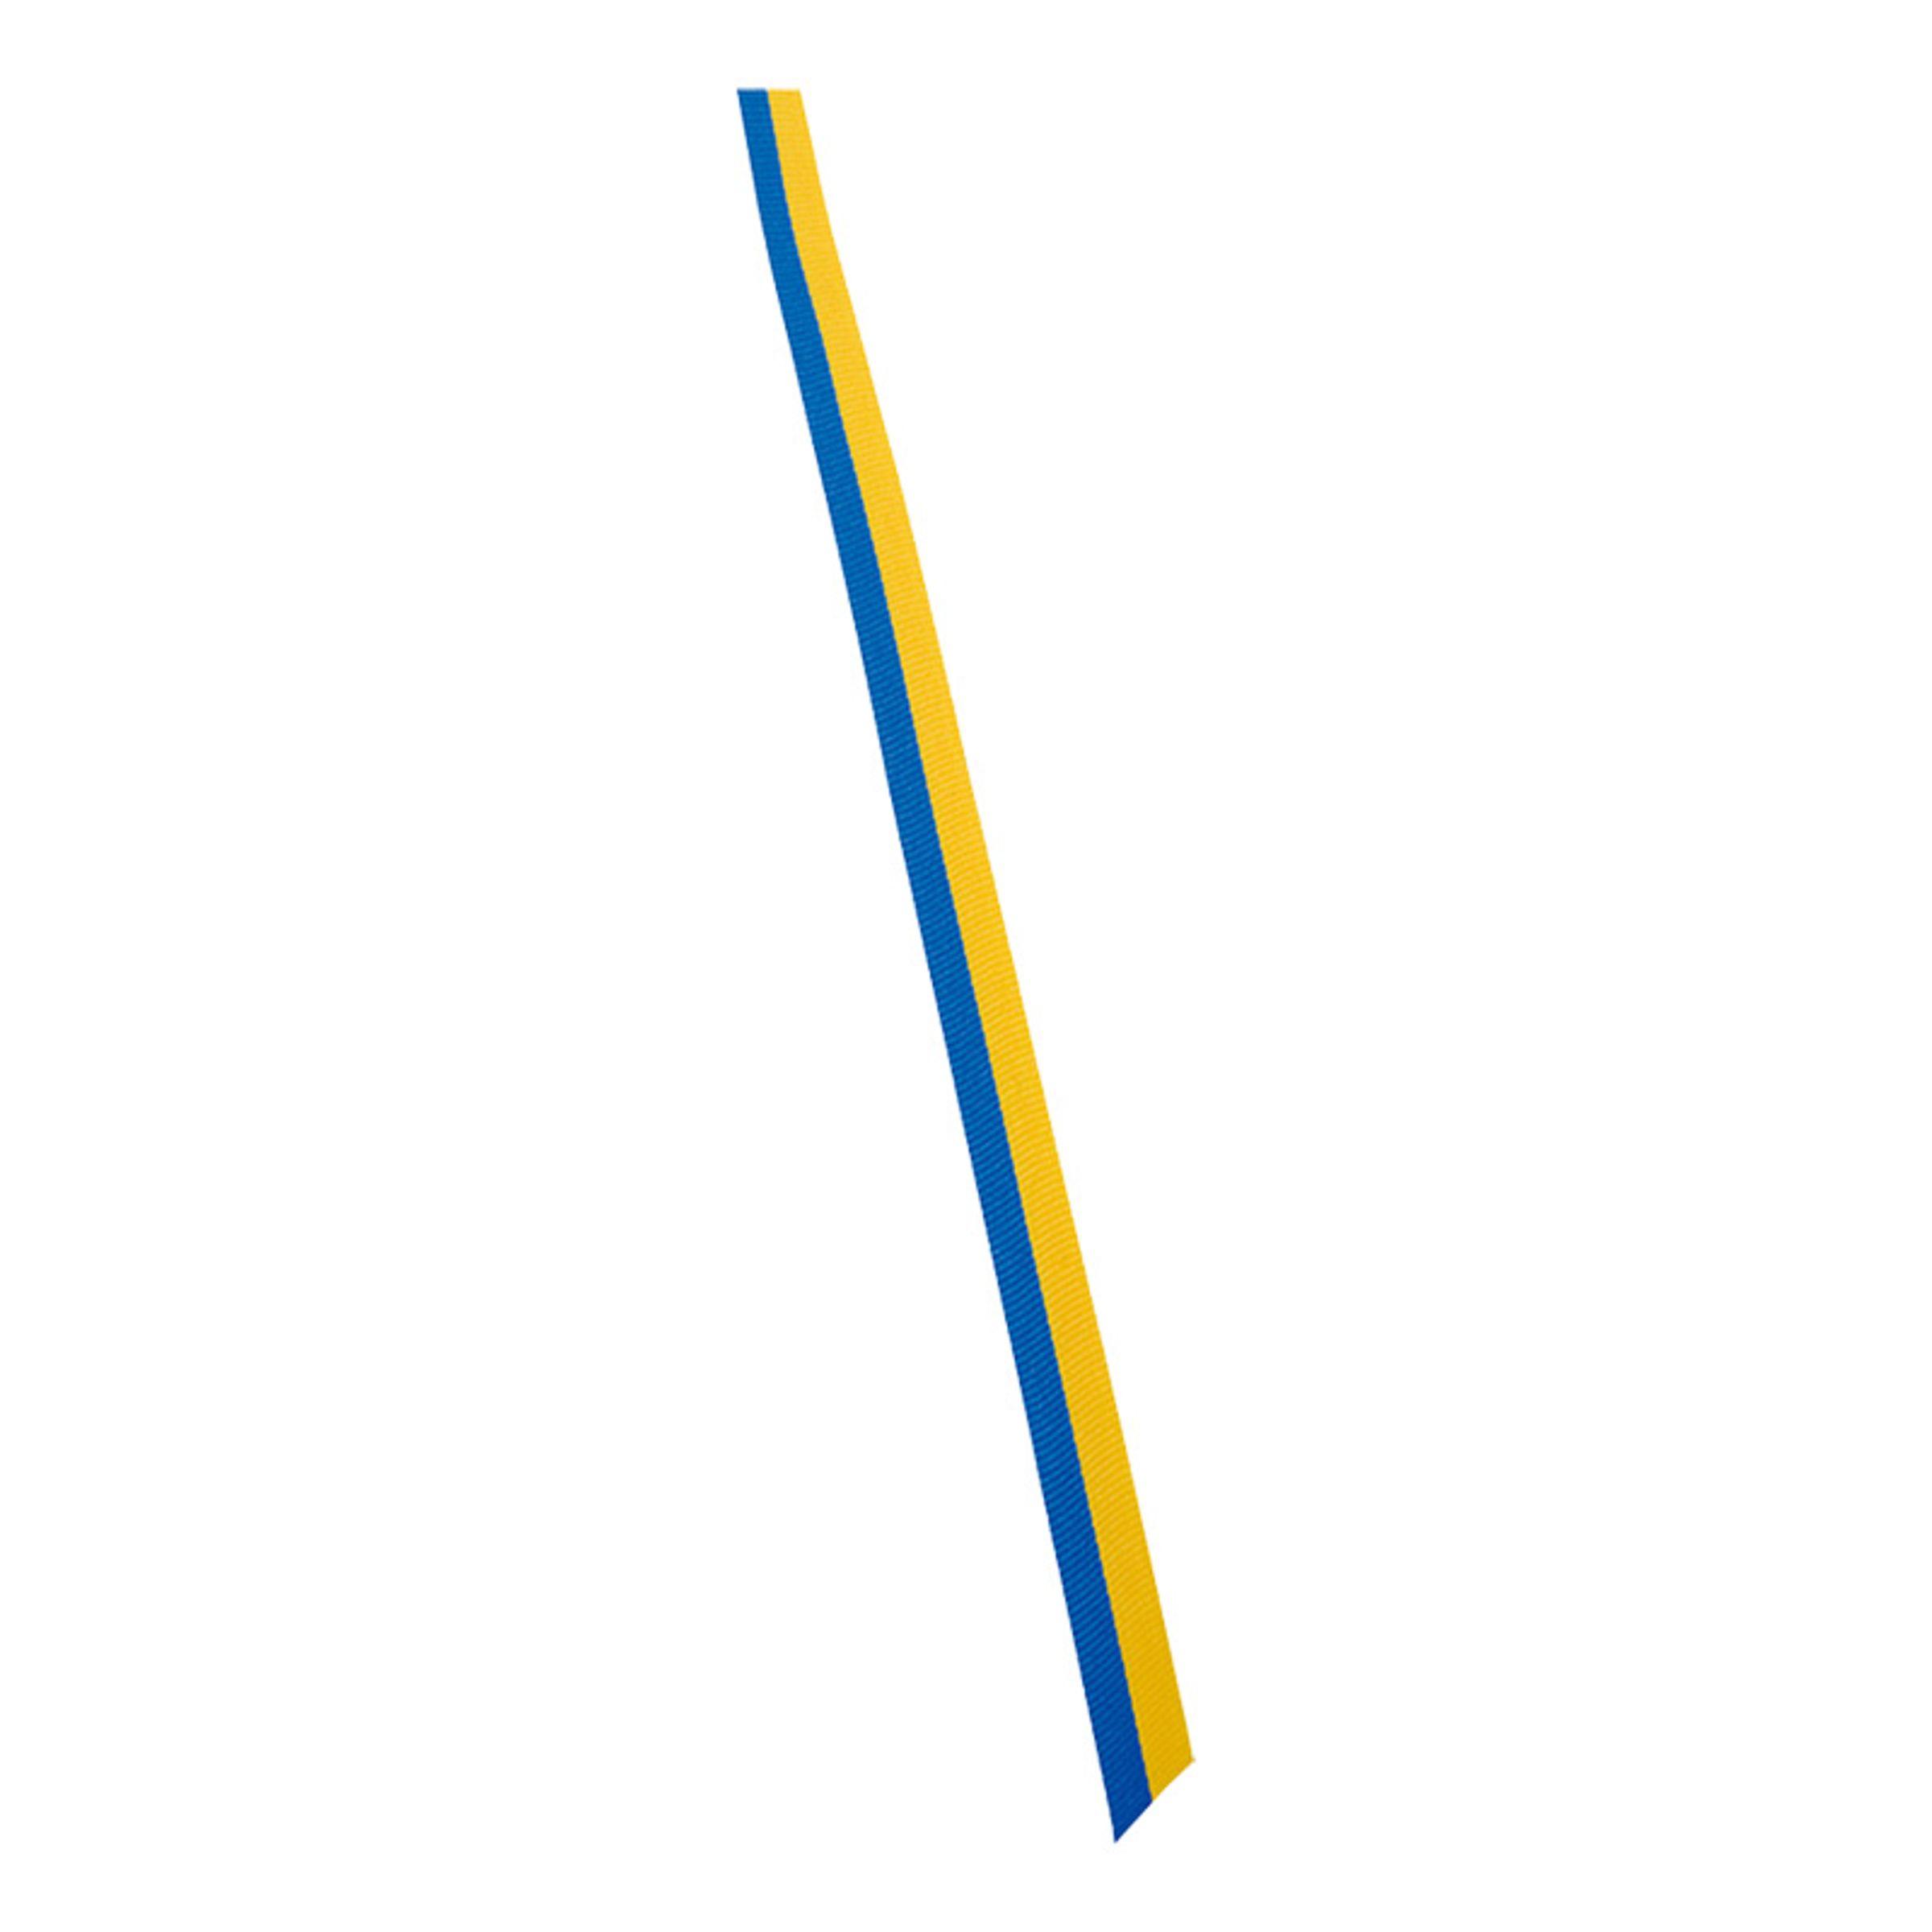 Sverigeband Blå/Gul - 2,5cmx4m